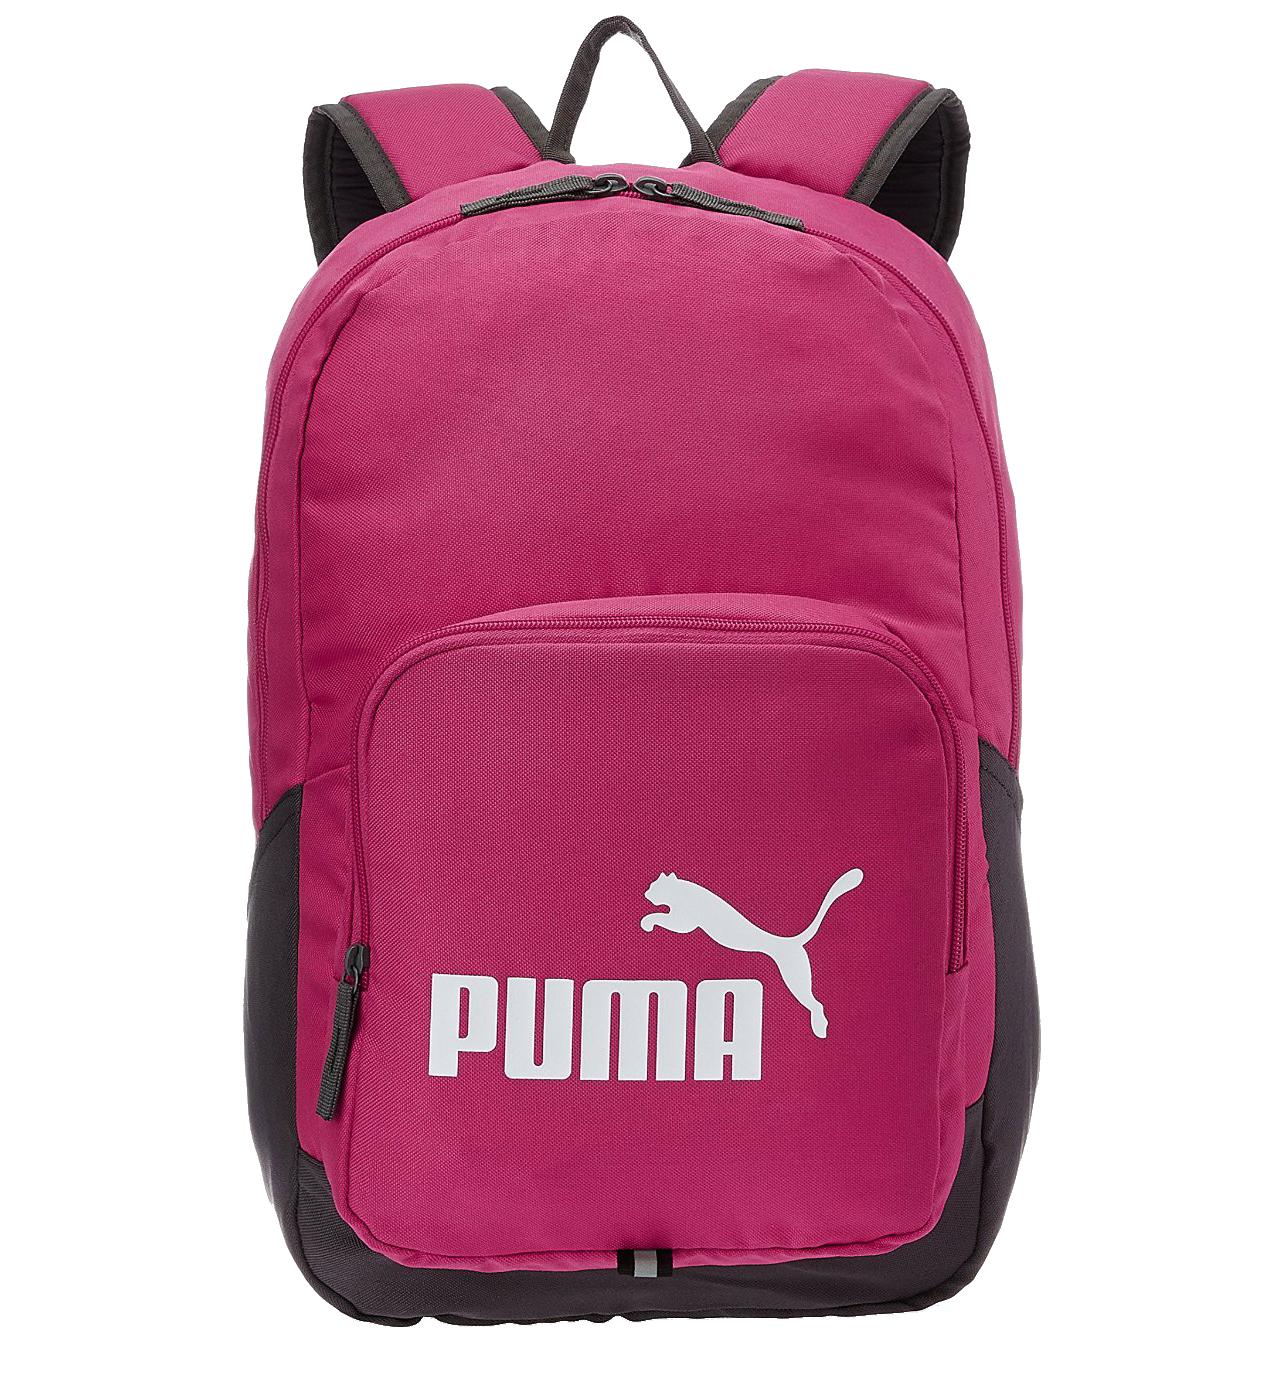 Puma Travel Bag PNG Image